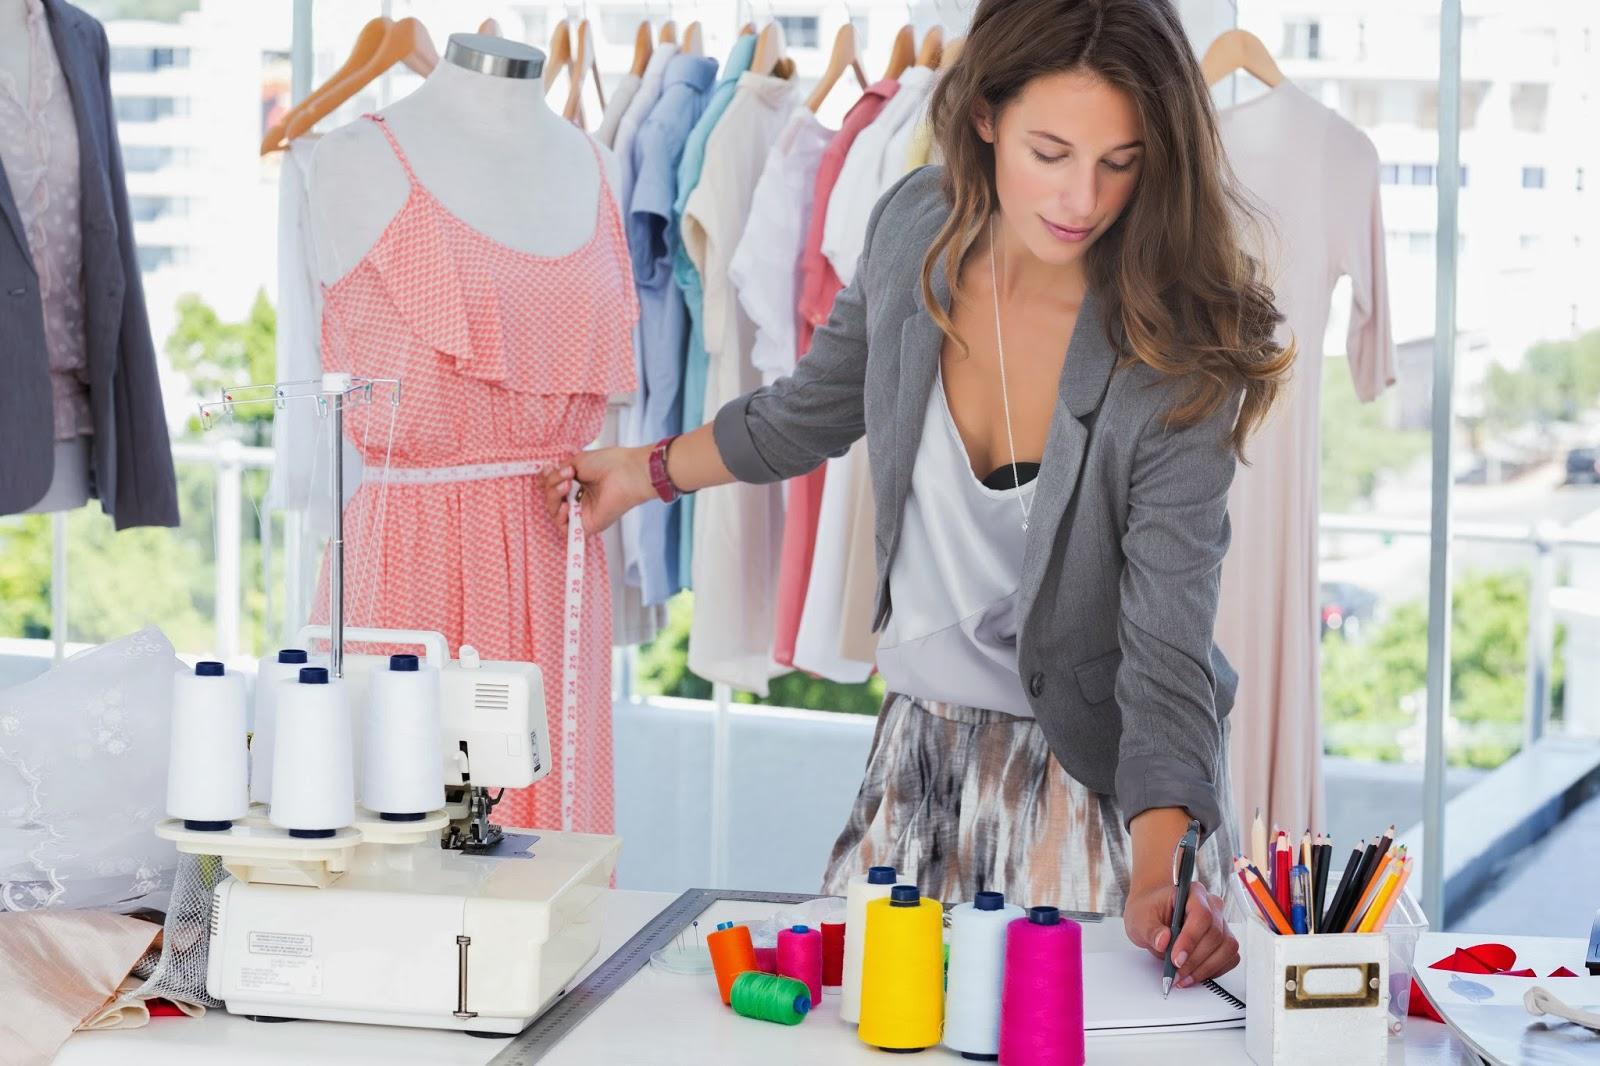 designer designers working looking boutique shutterstock